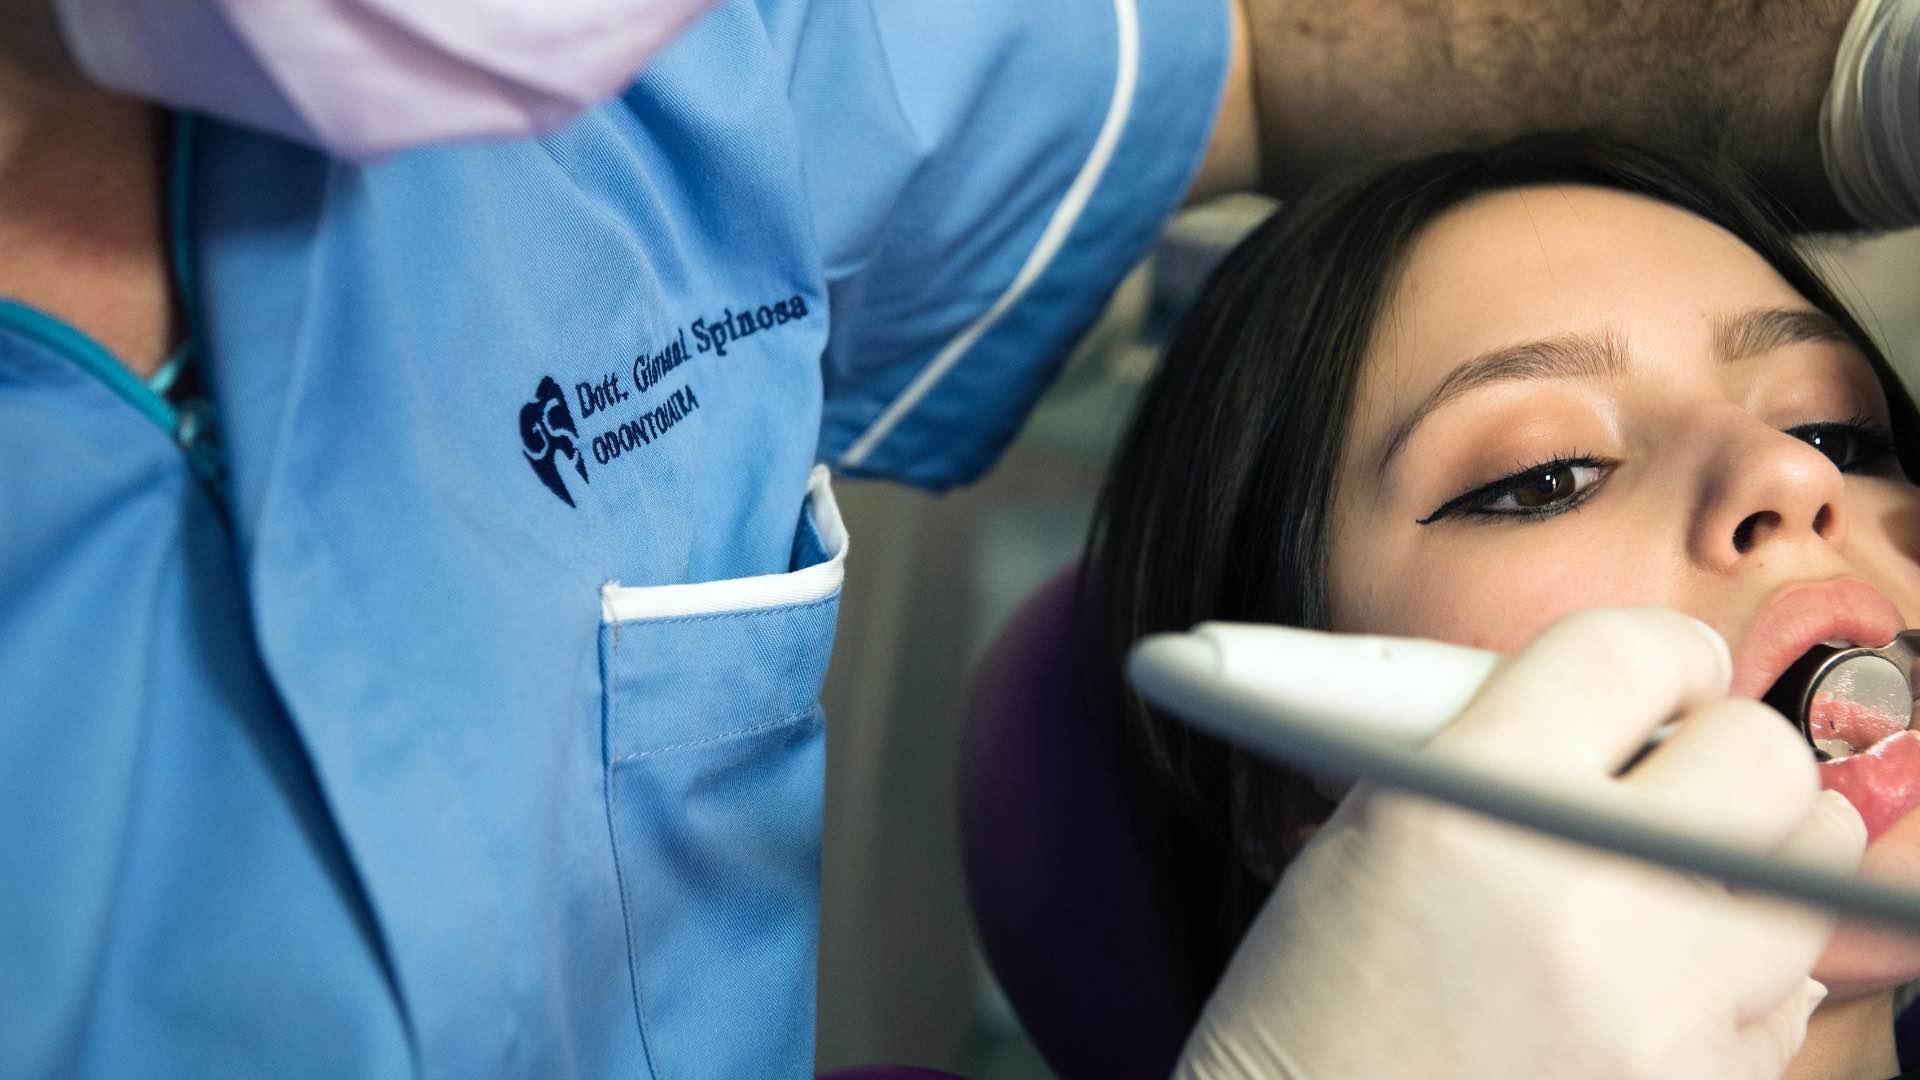 Studio dentistico Spinosa 31 | Dentista a Gaeta